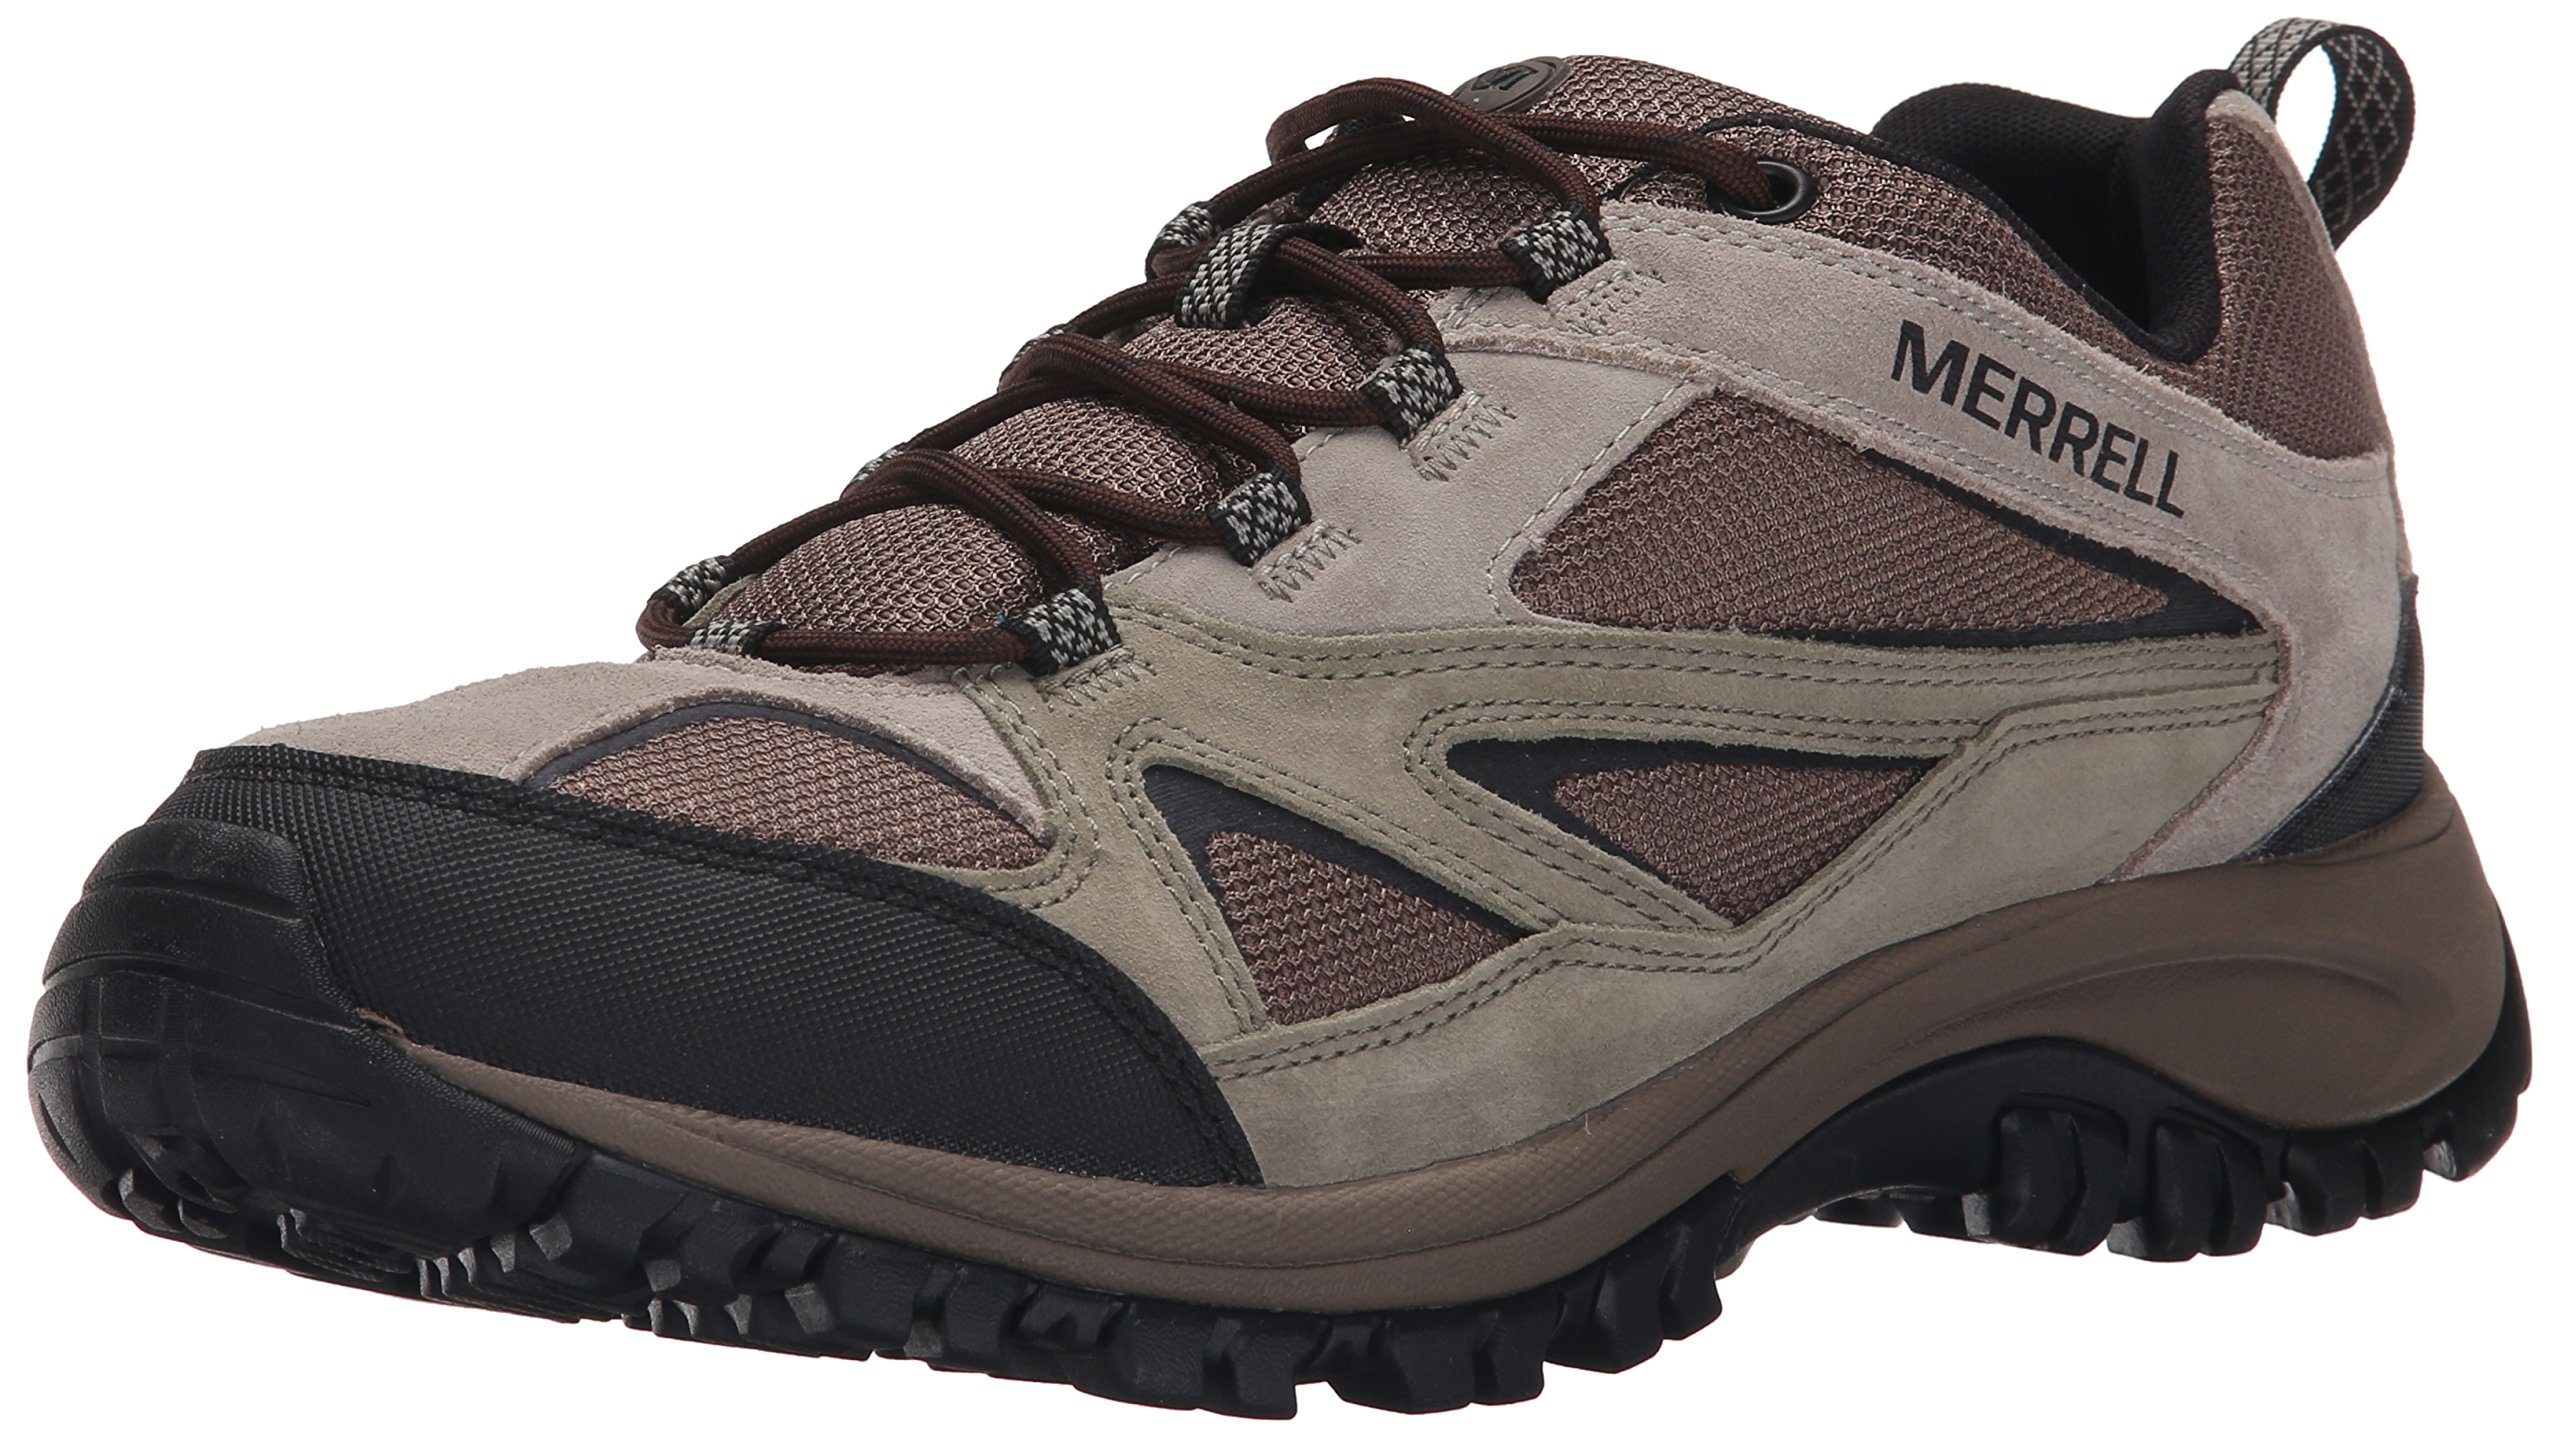 Merrell Men's Phoenix Bluff Hiking Shoe, Putty, 13 M US